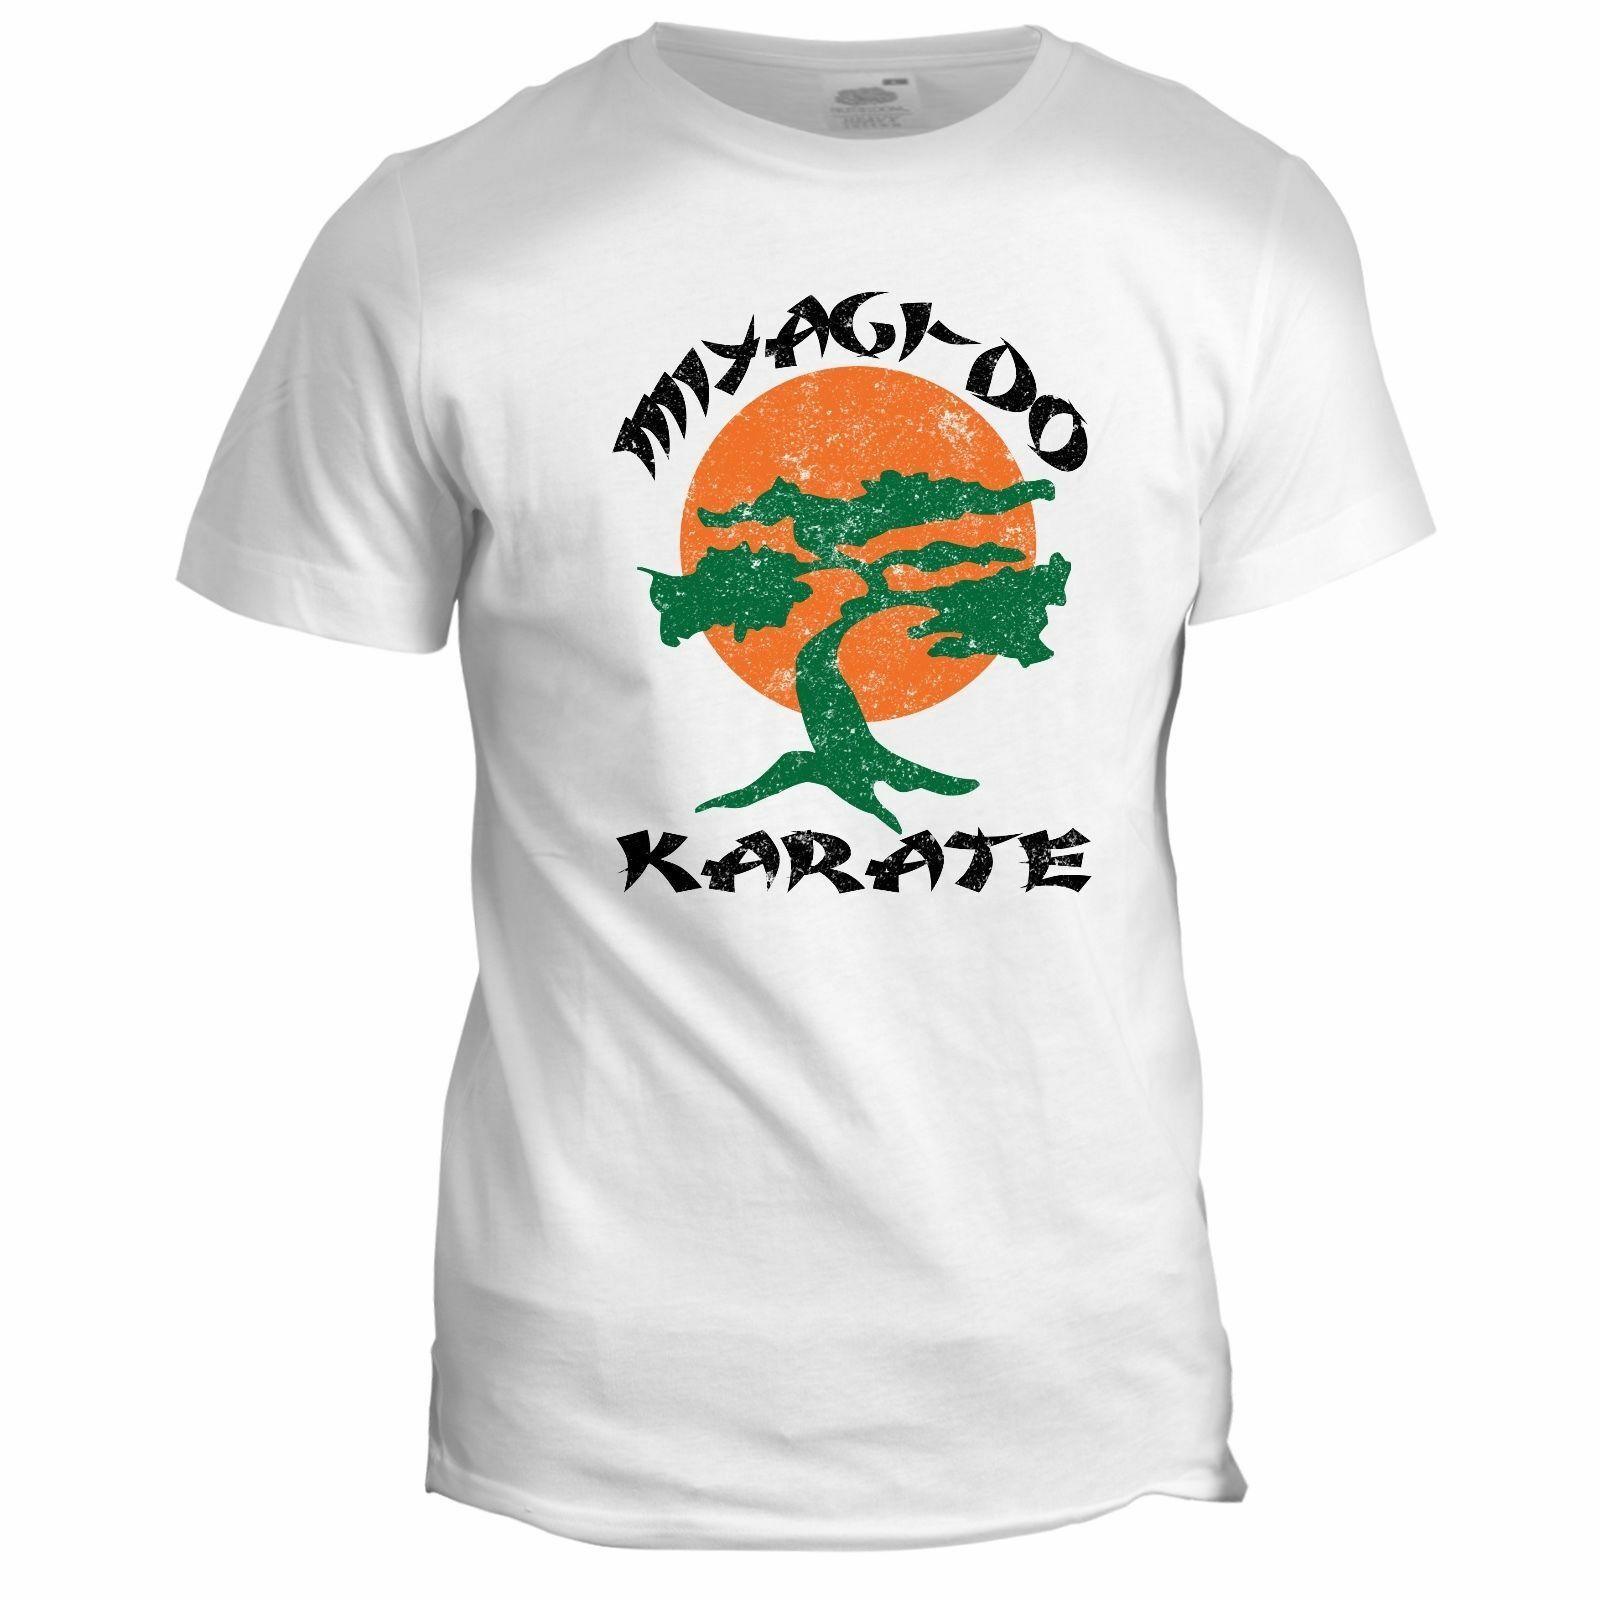 Karate Kid Japanese Kung Fu Martial Arts Chinese manga film movie sci fi T Shirt